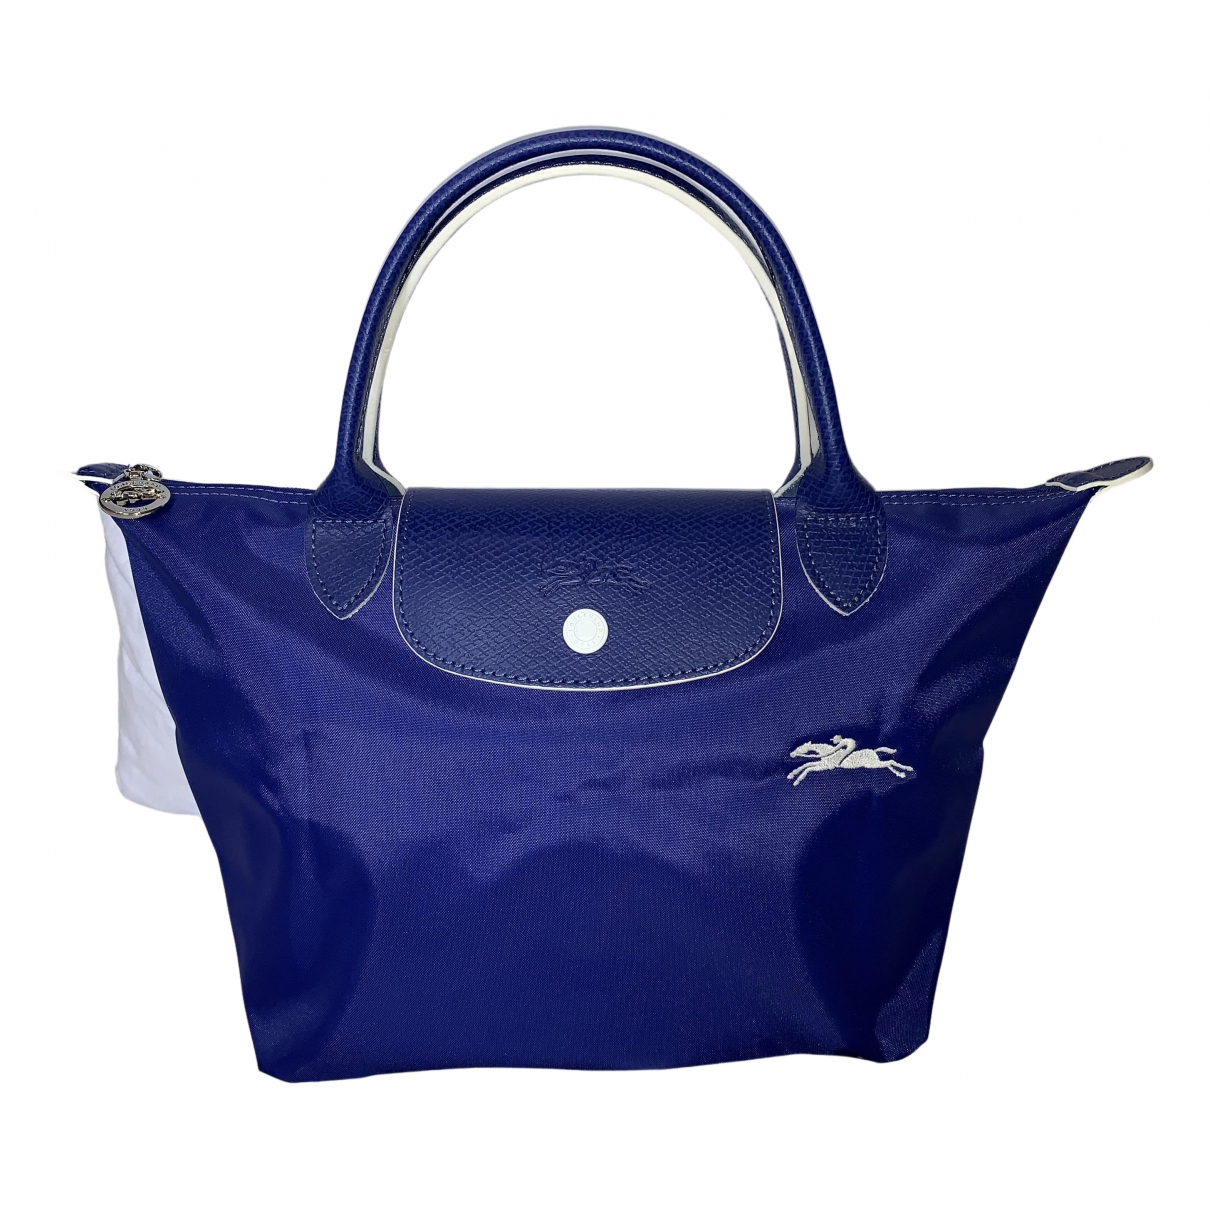 Longchamp Pliage  Blue Cloth handbag for Women N